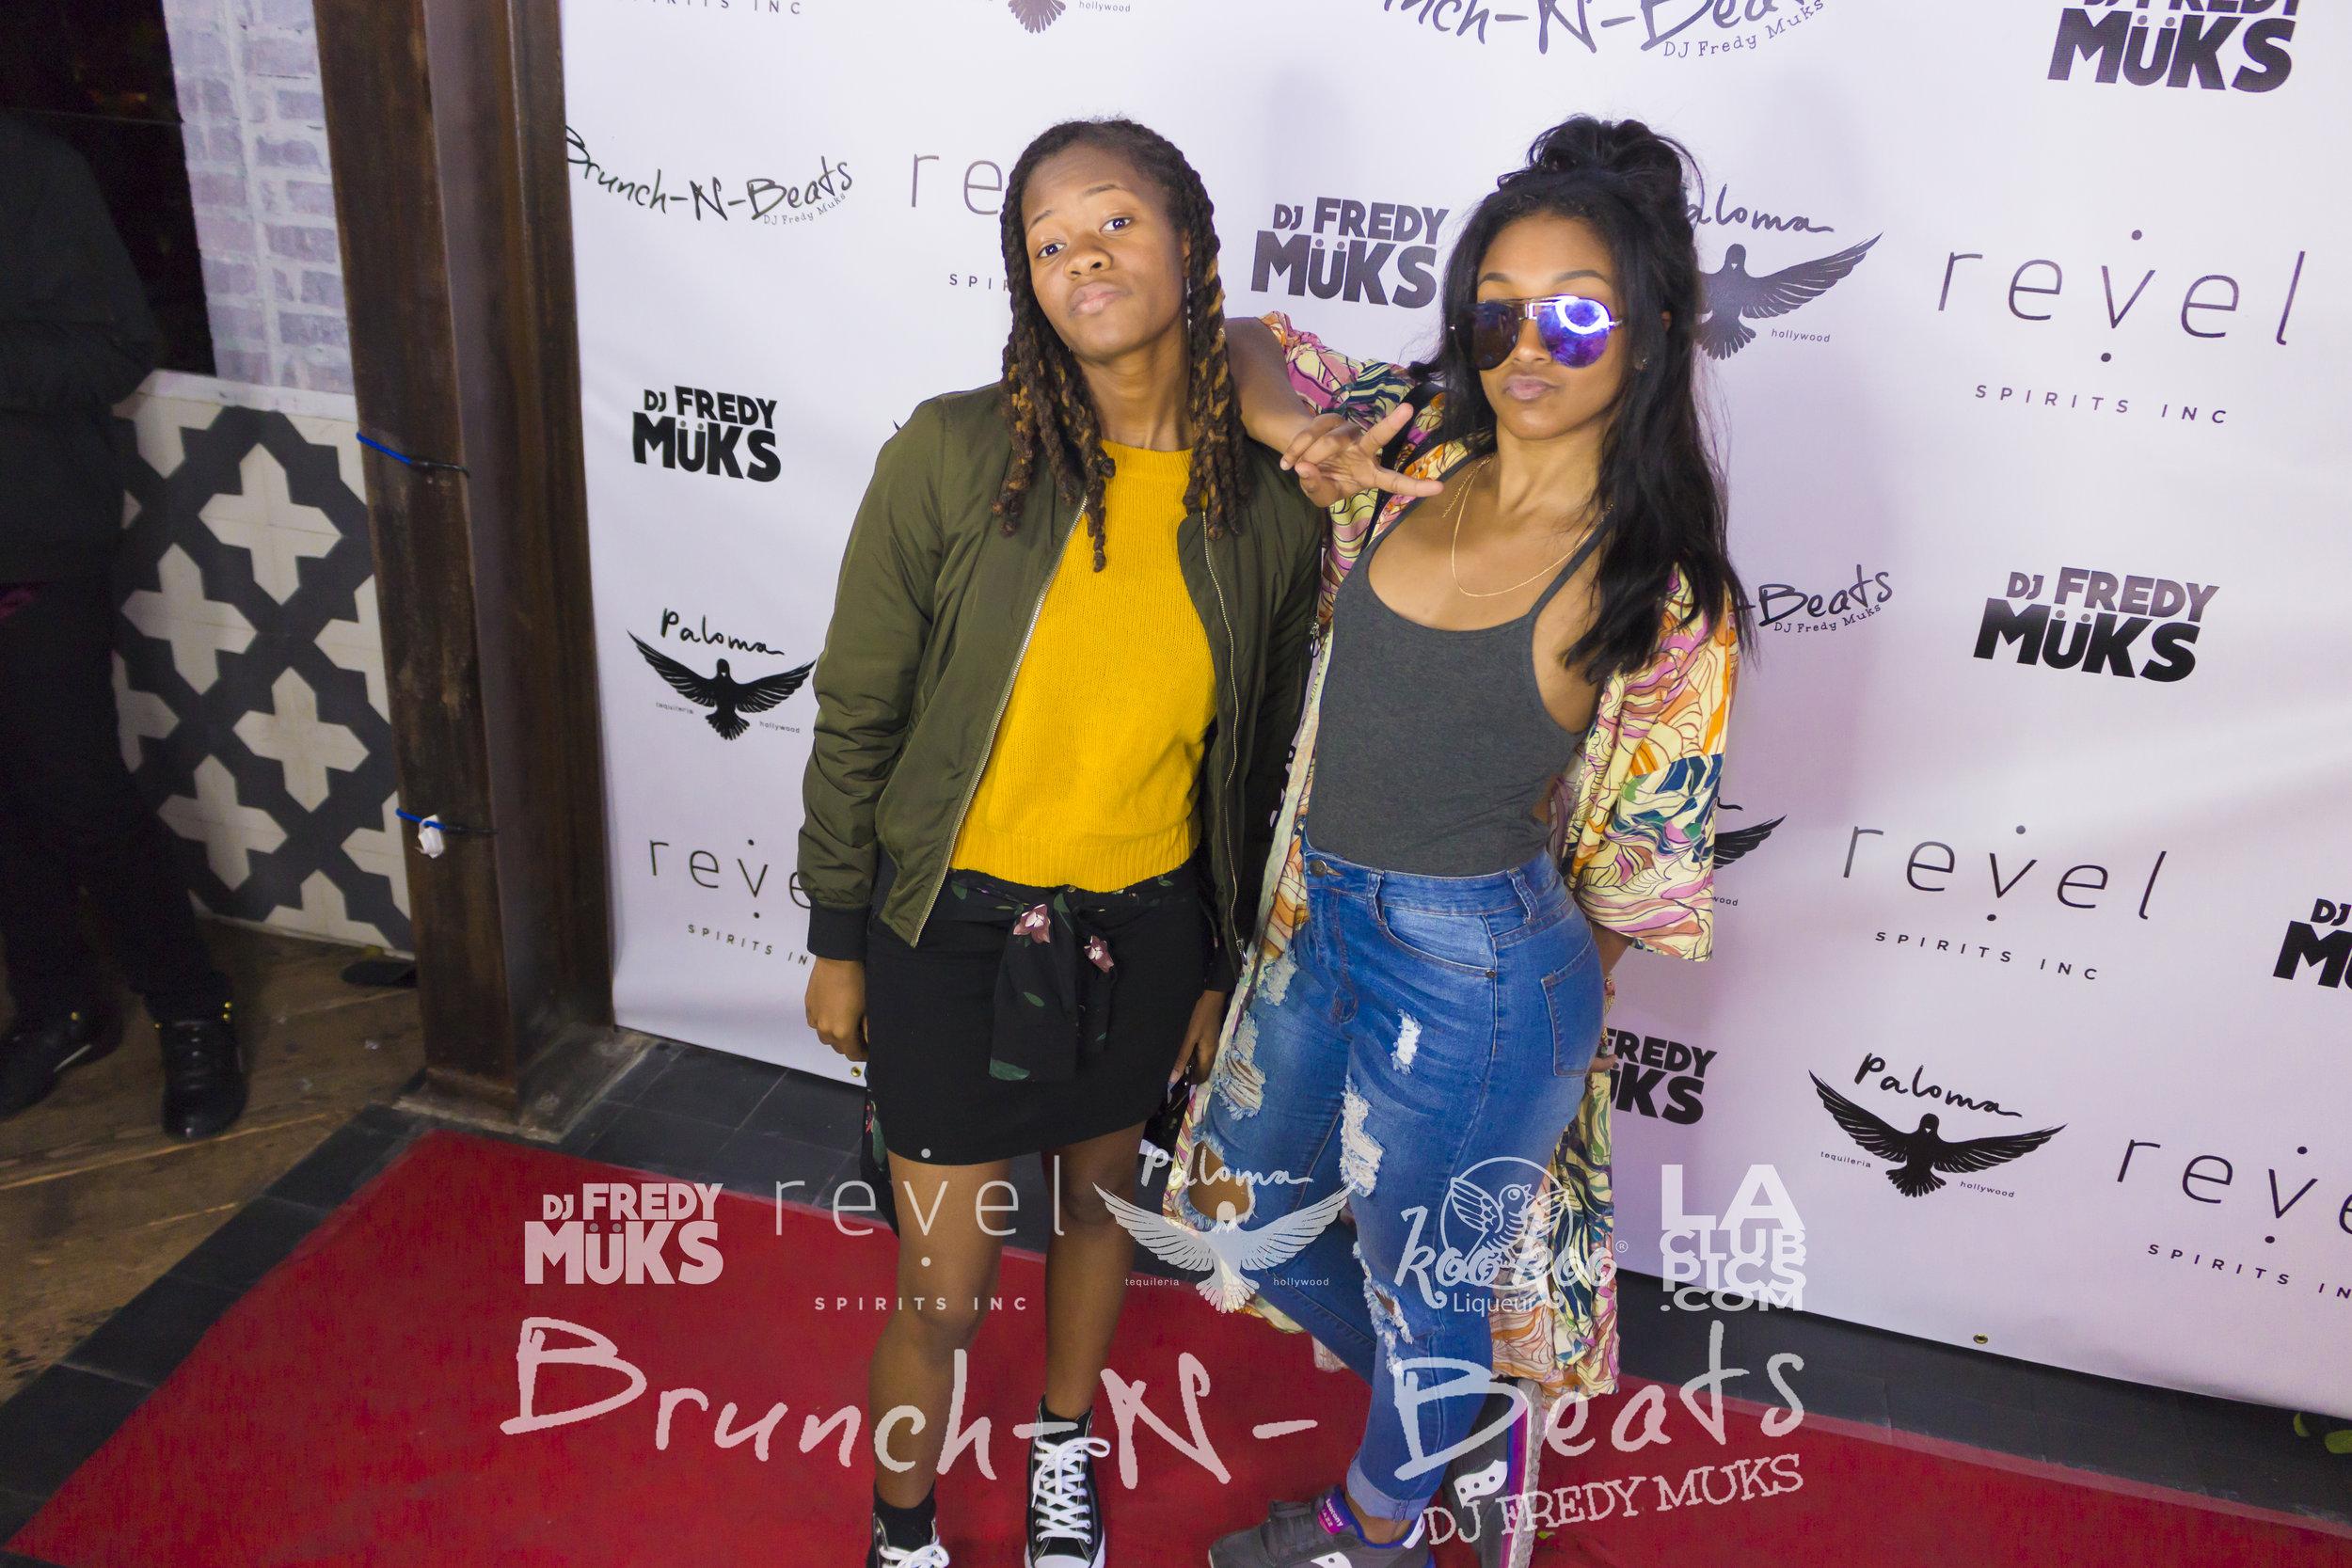 Brunch-N-Beats - Paloma Hollywood - 02-25-18_128.jpg